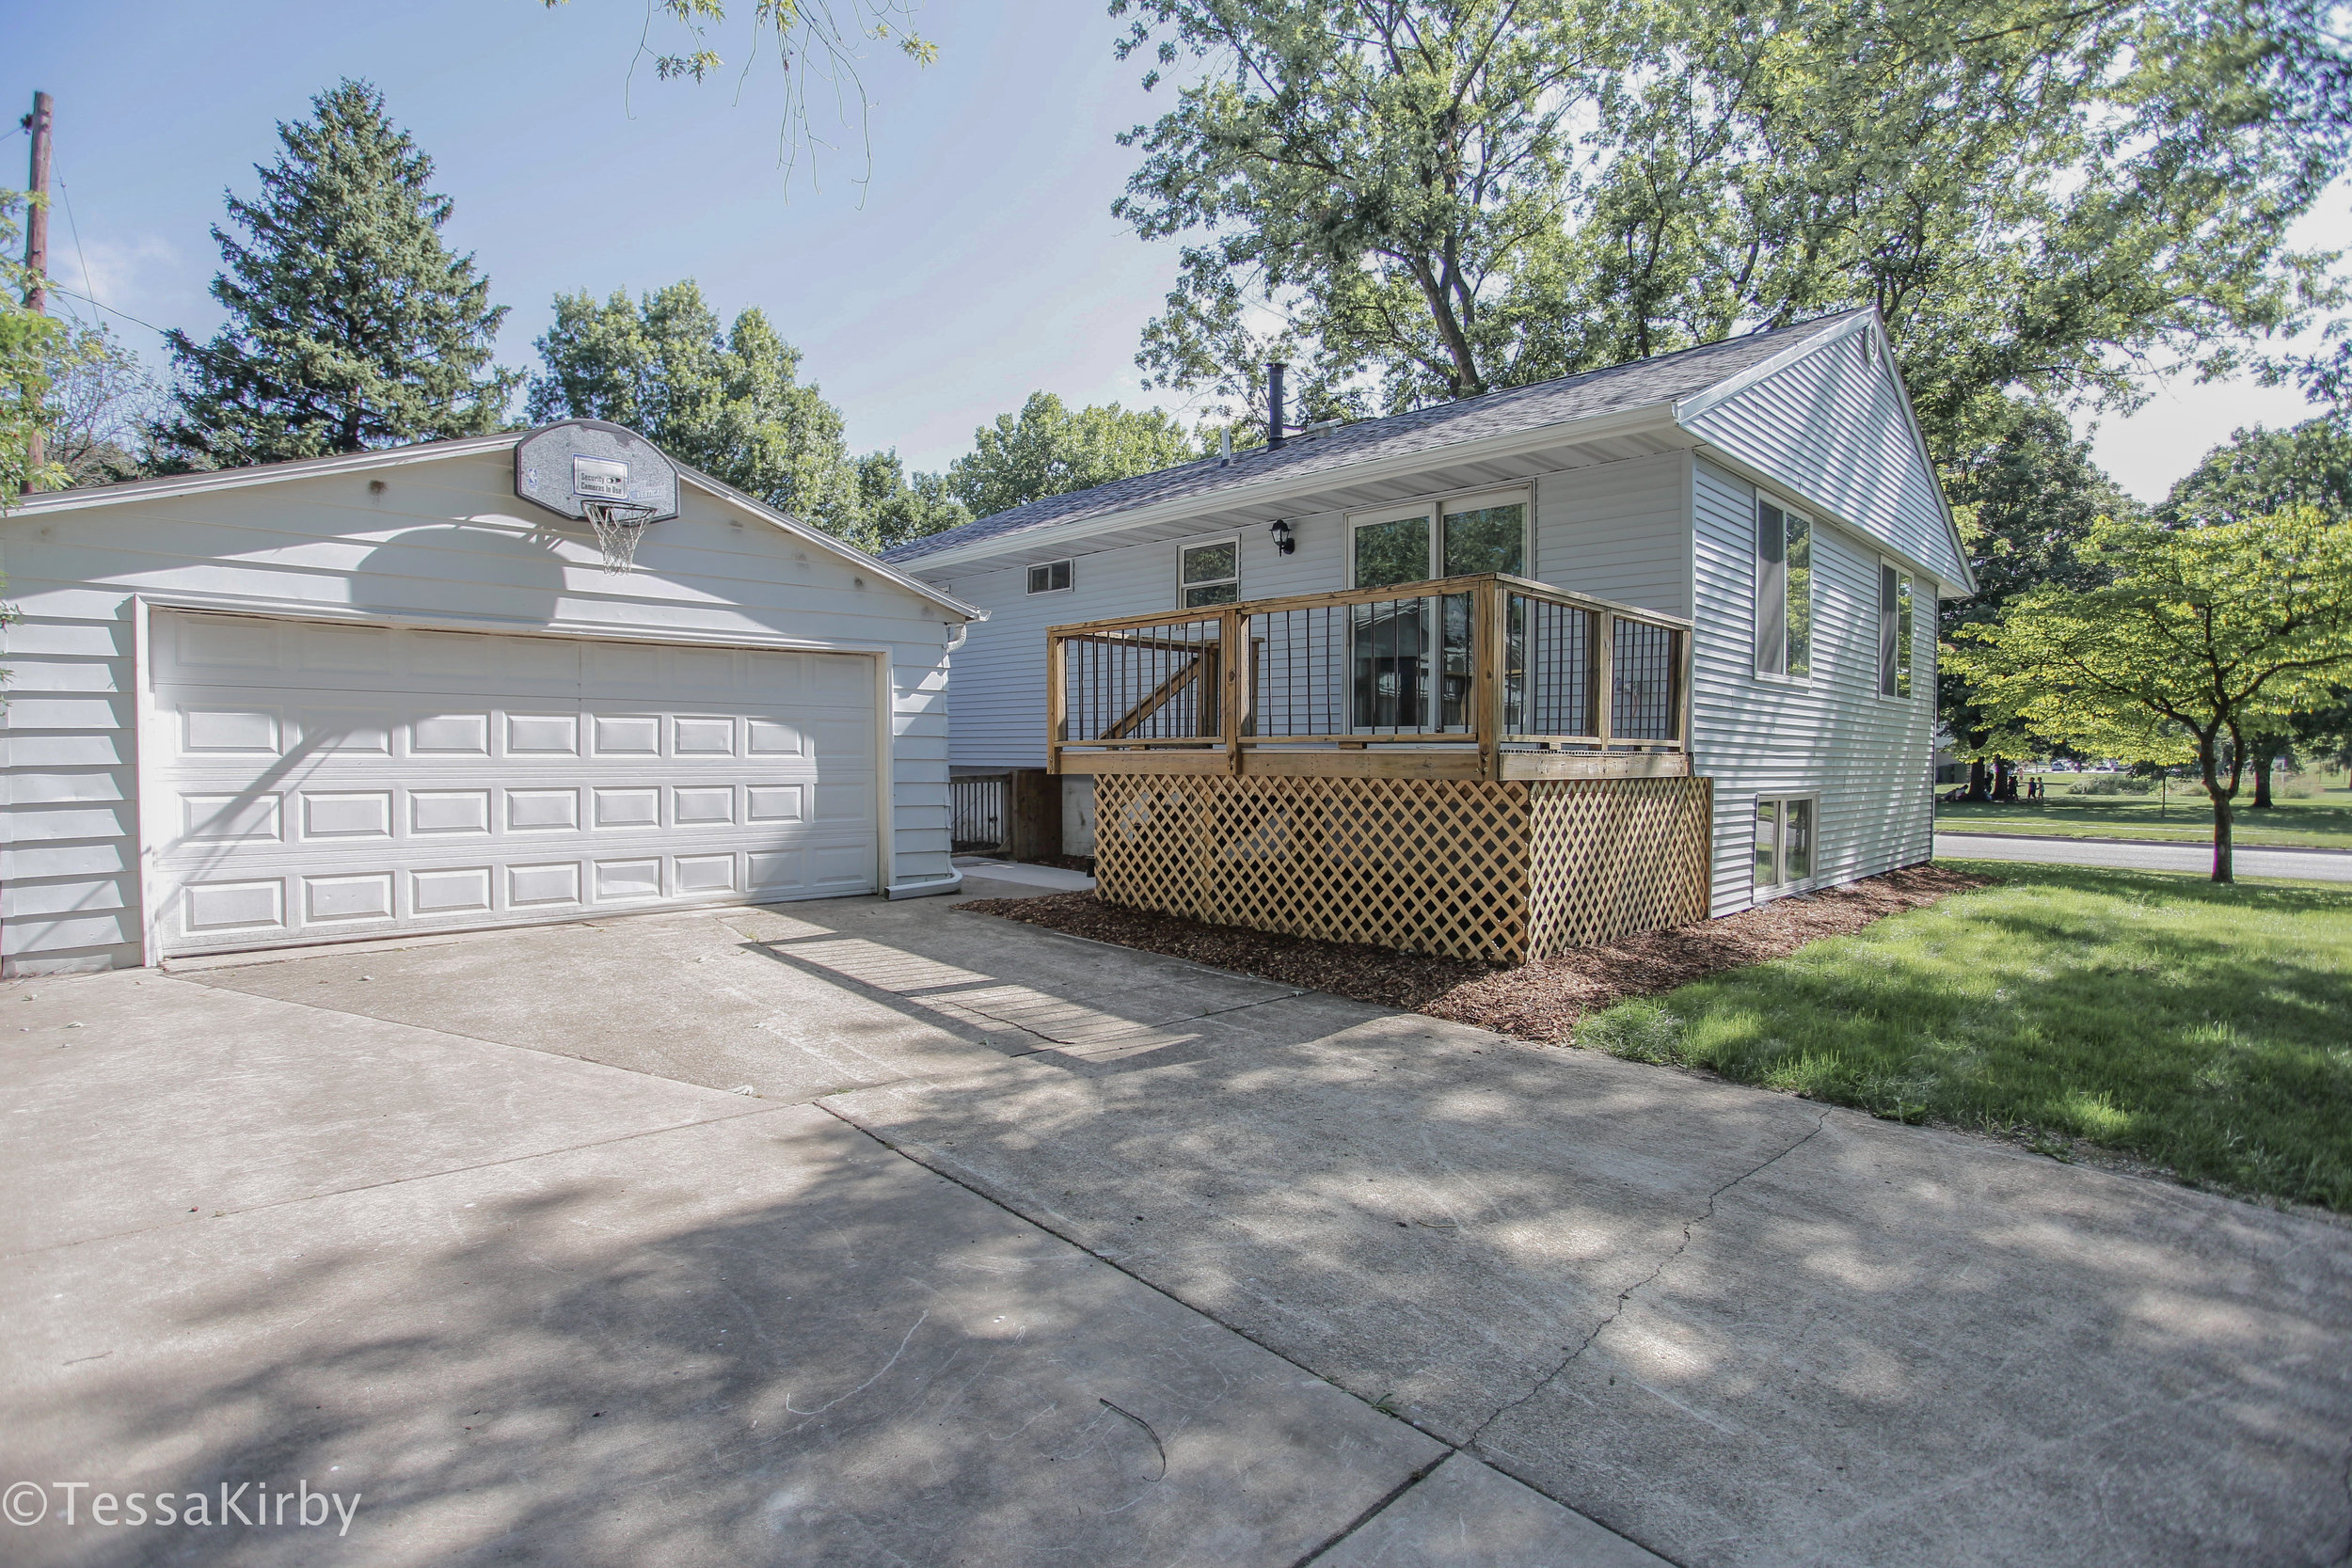 Our Little Blue Flip House Revealed